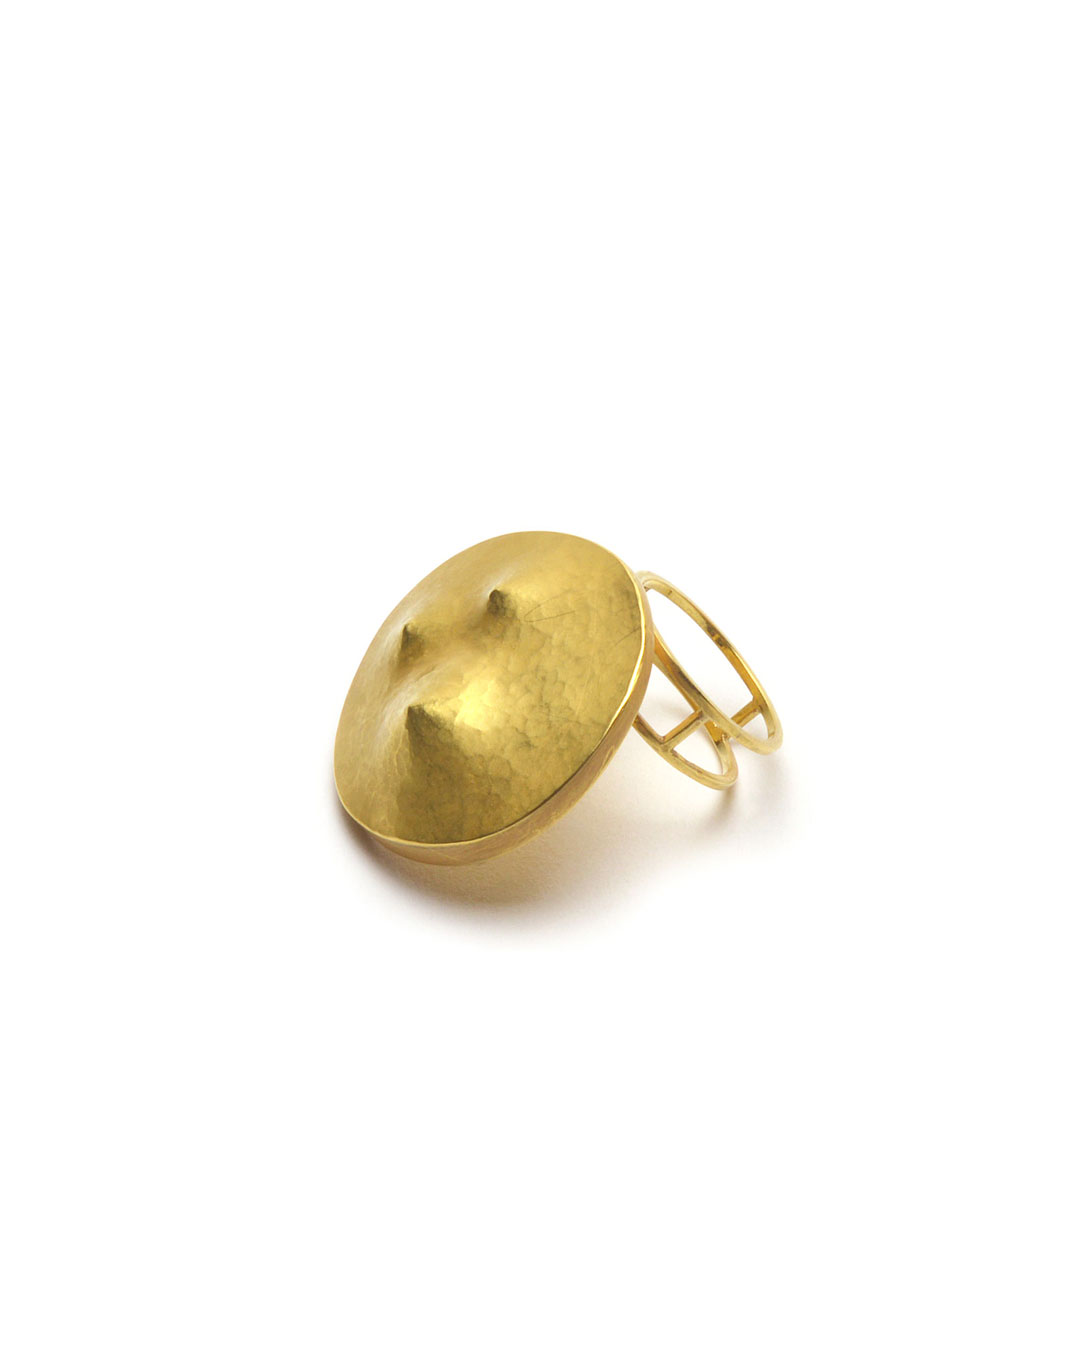 Stefano Marchetti, untitled, 2014, ring; gold, 27 x 32 x 31 mm, €3900